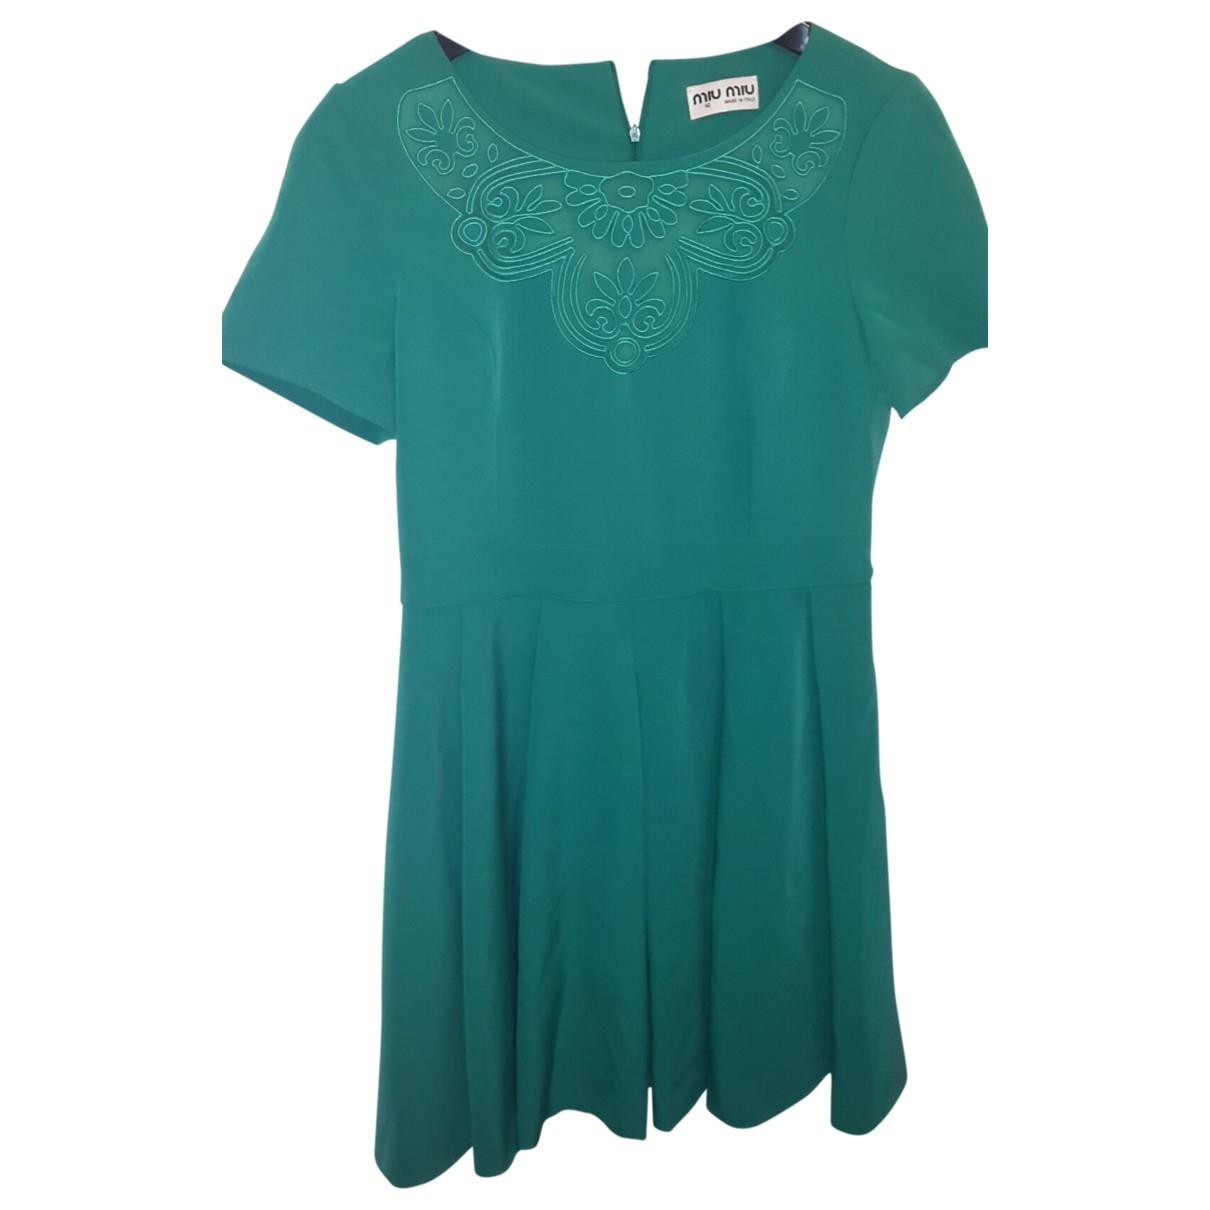 Miu Miu \N Green dress for Women 40 FR